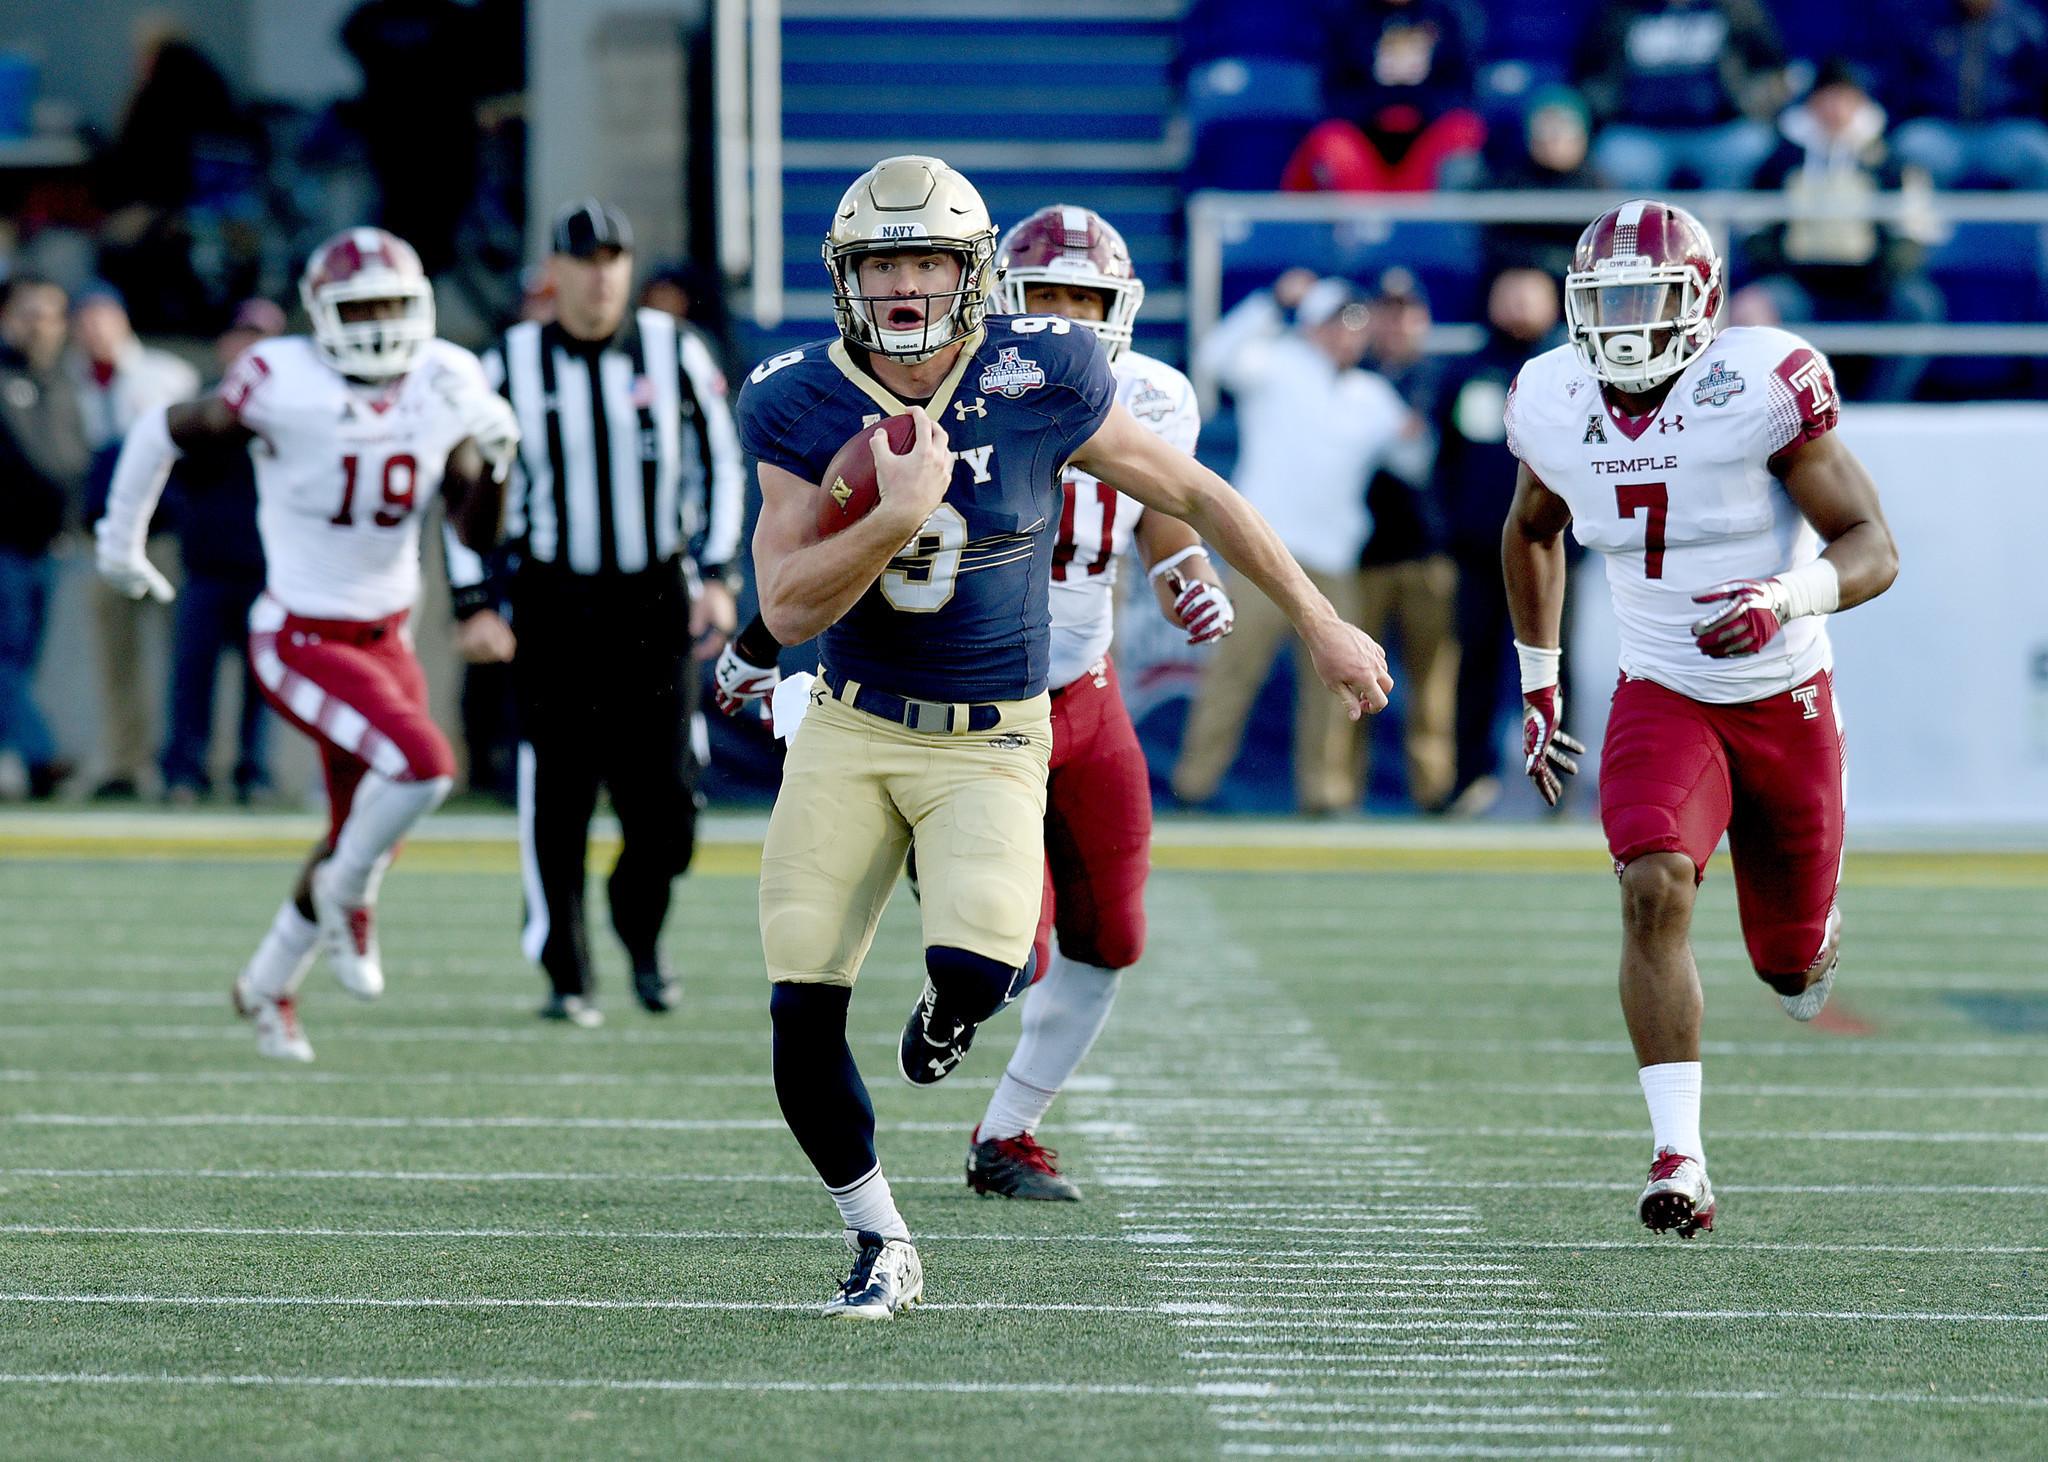 College Football Rankings: Navy Midshipmen